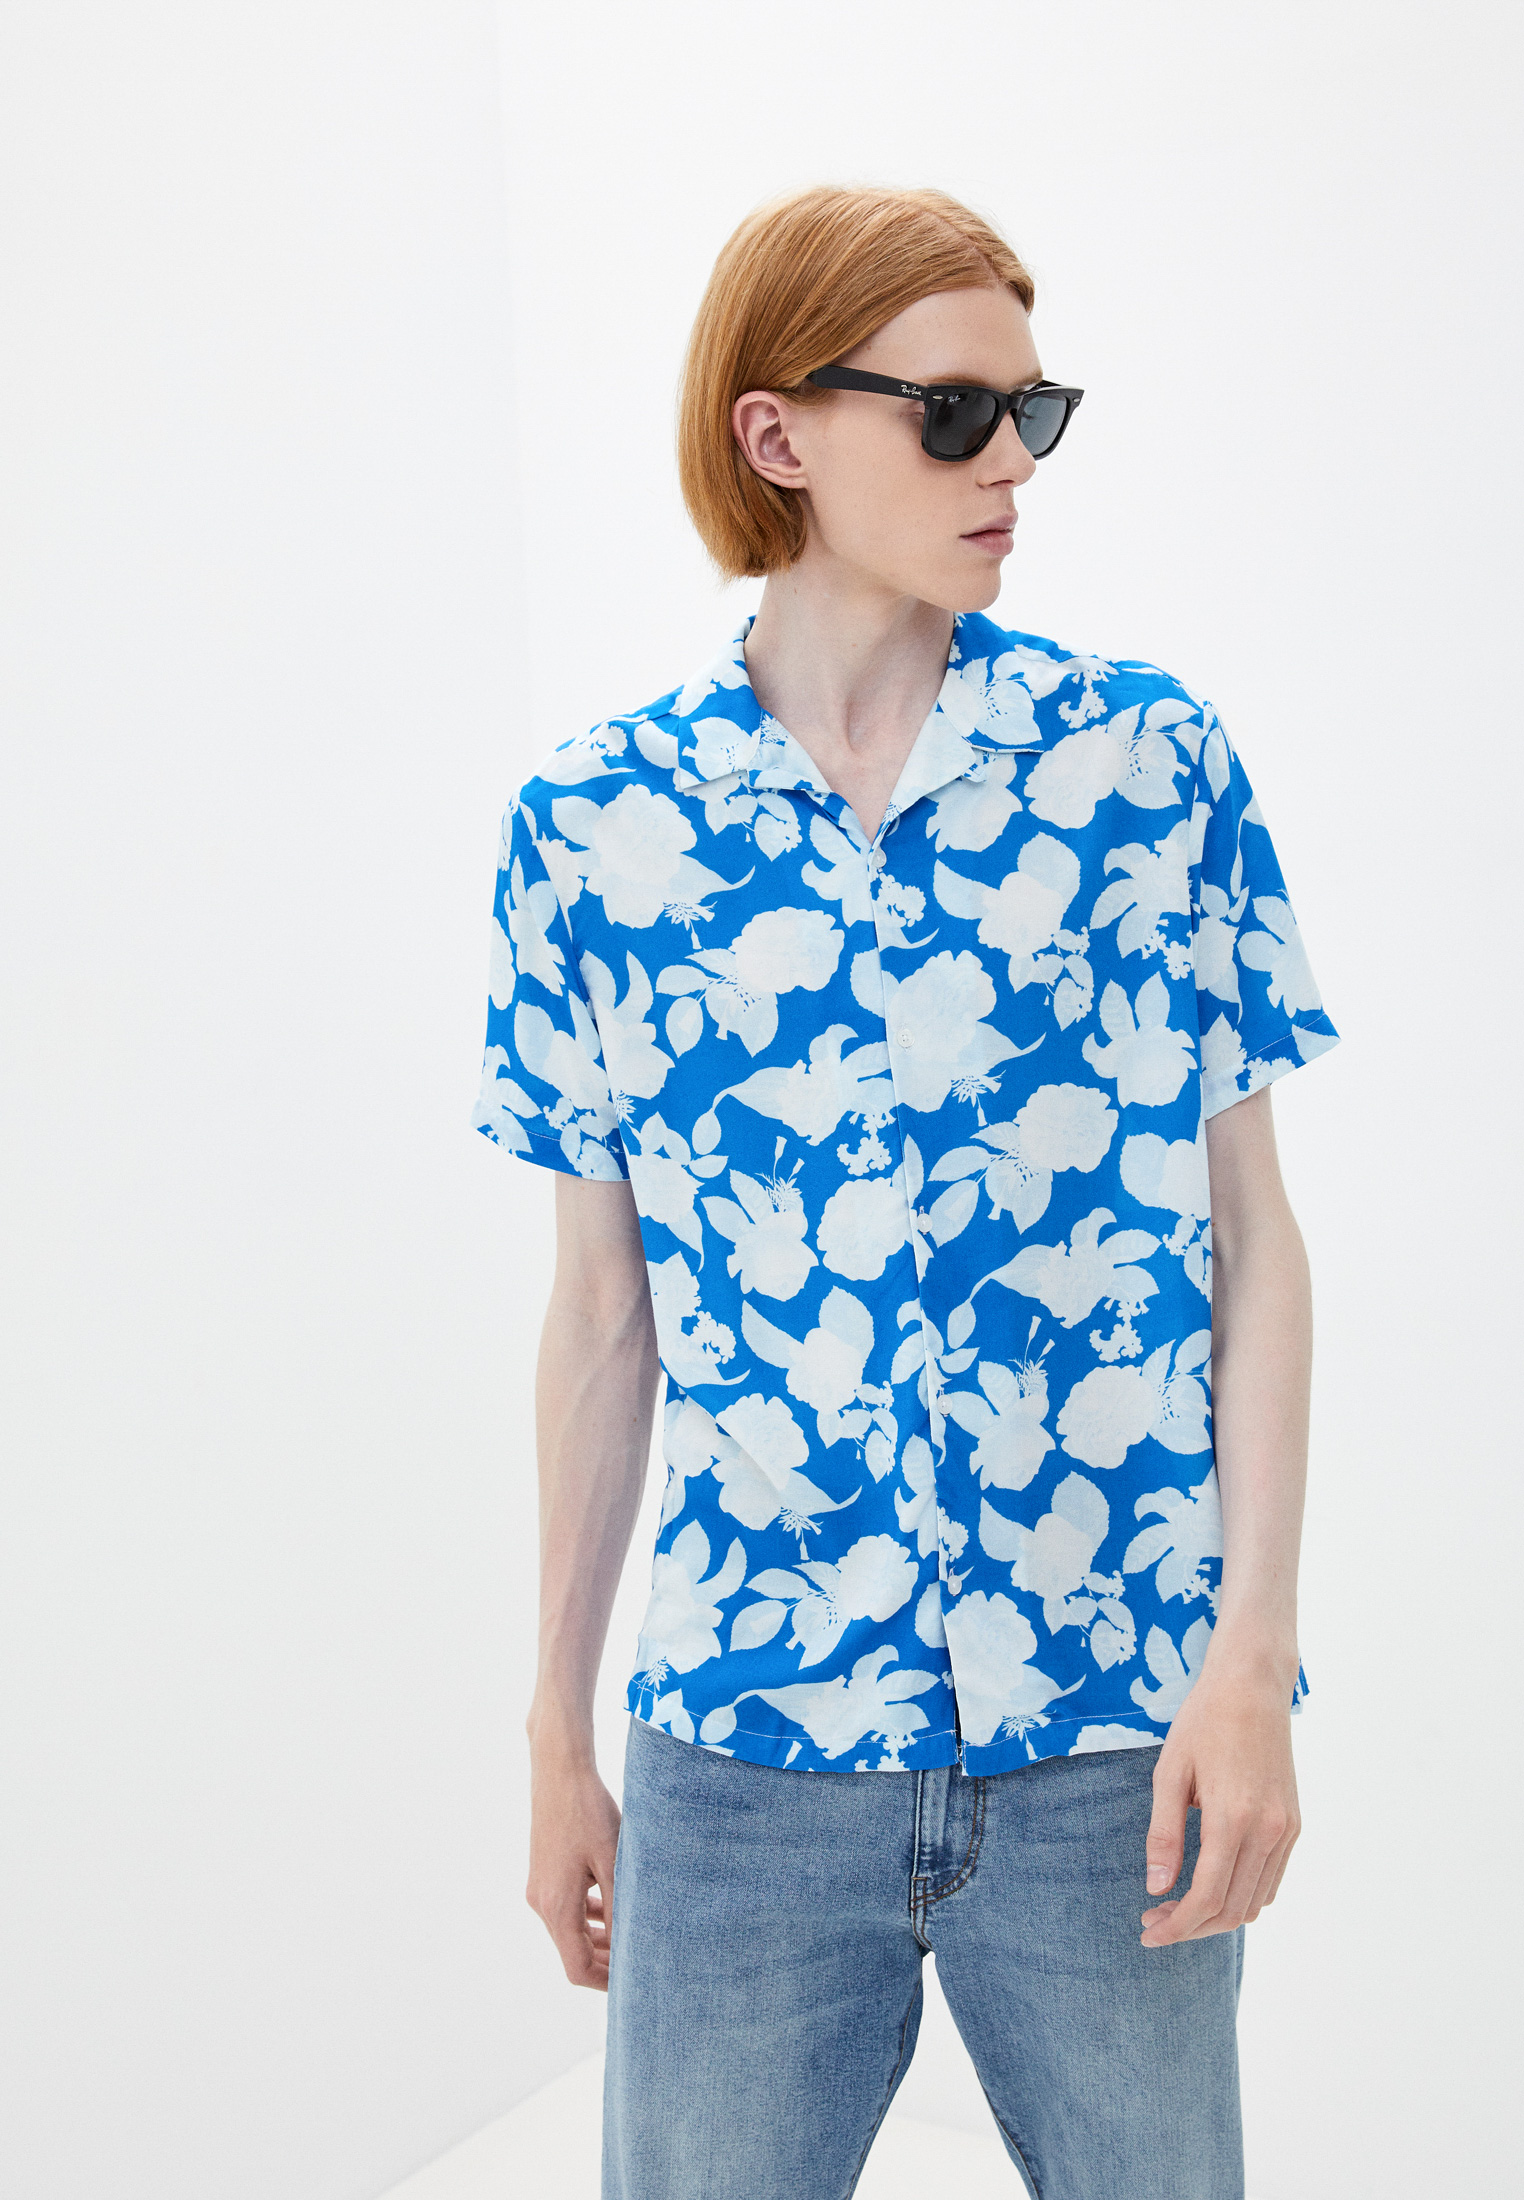 Рубашка с длинным рукавом Topman (Топмэн) Рубашка Topman